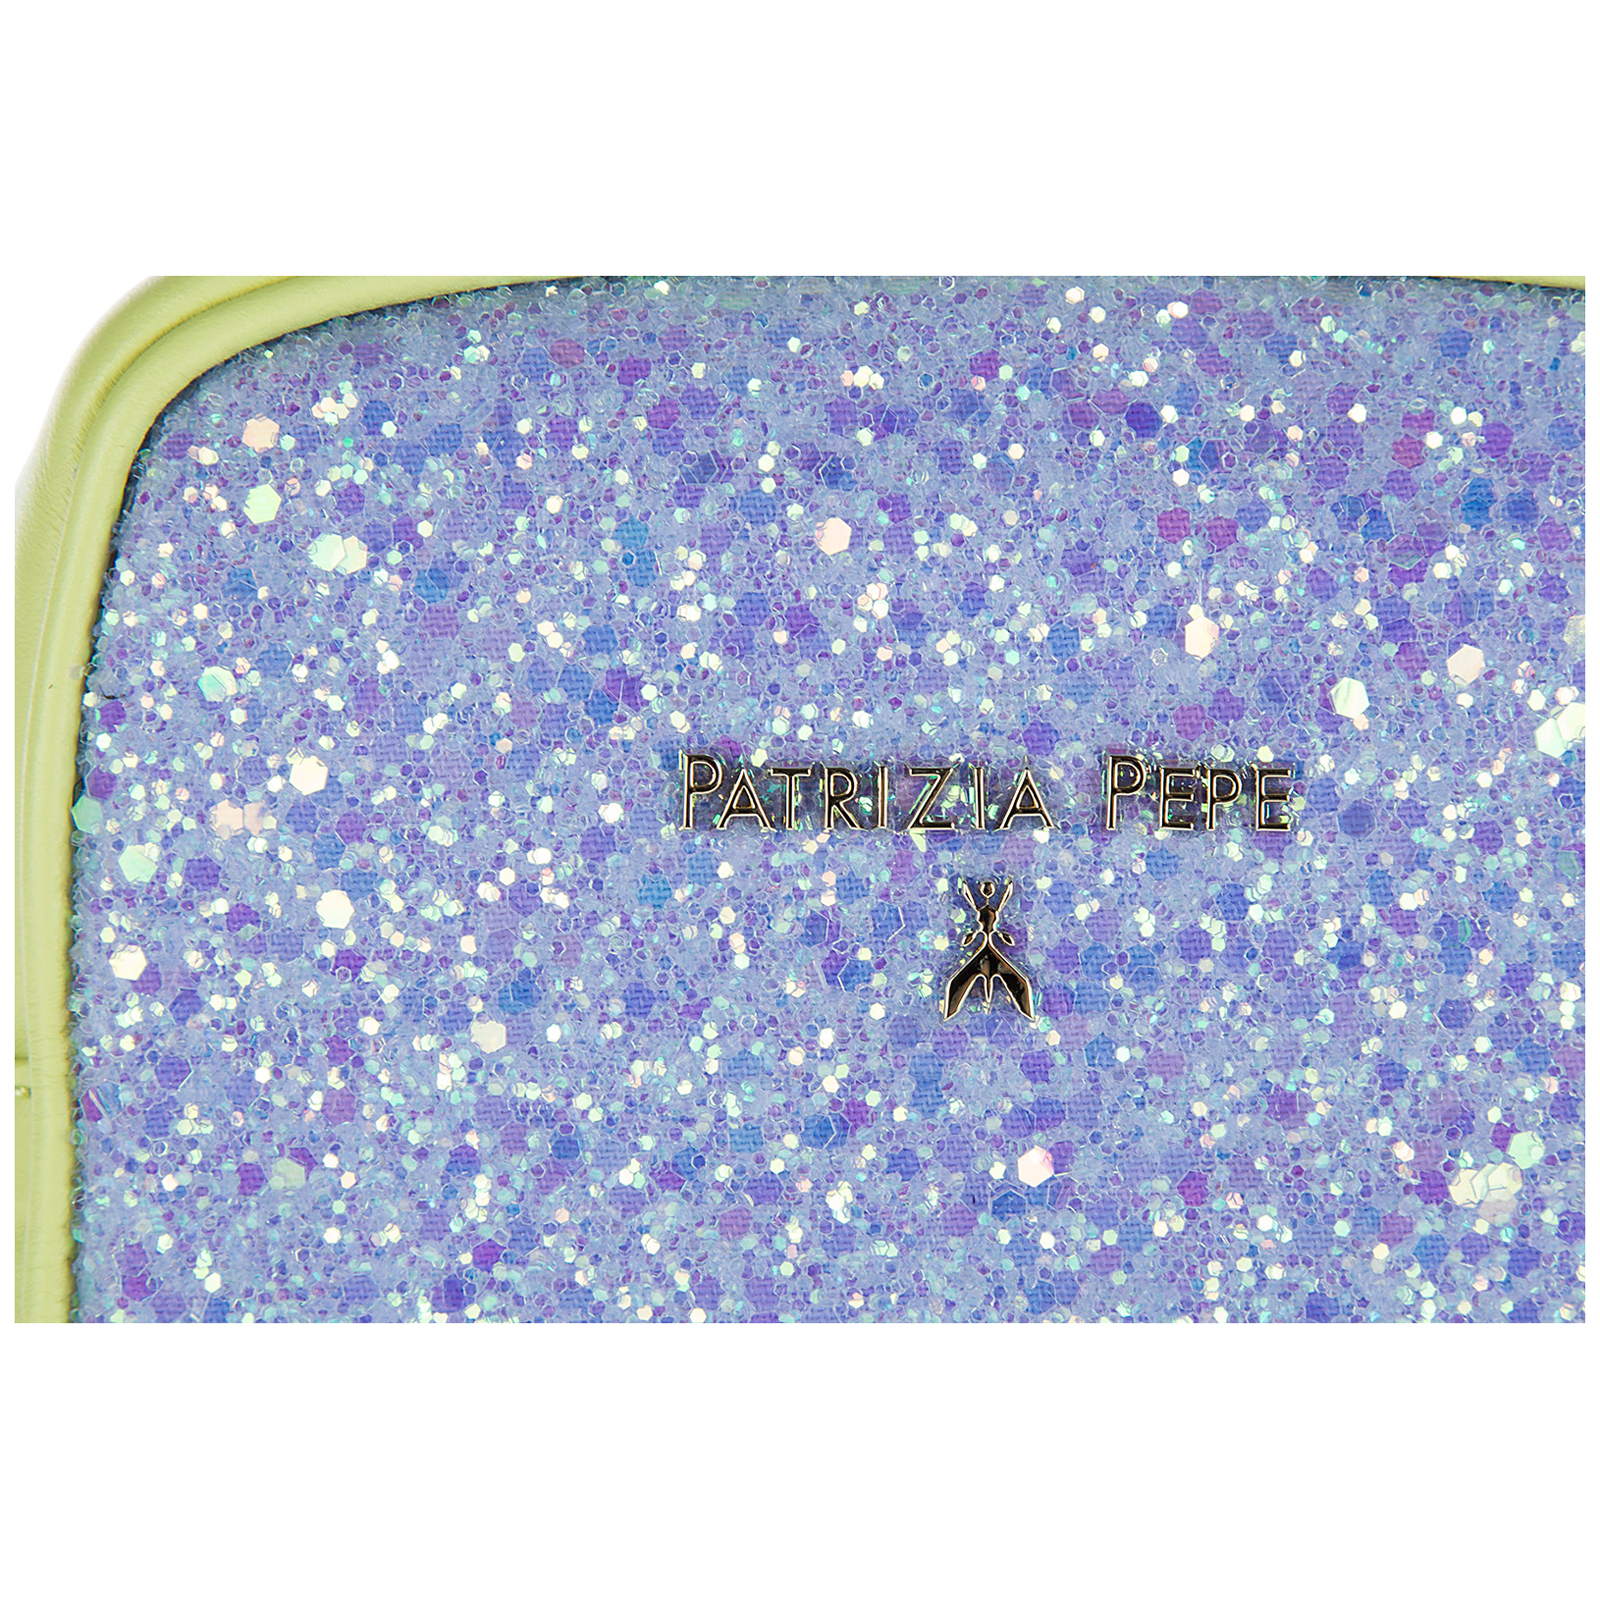 Women's clutch handbag bag purse